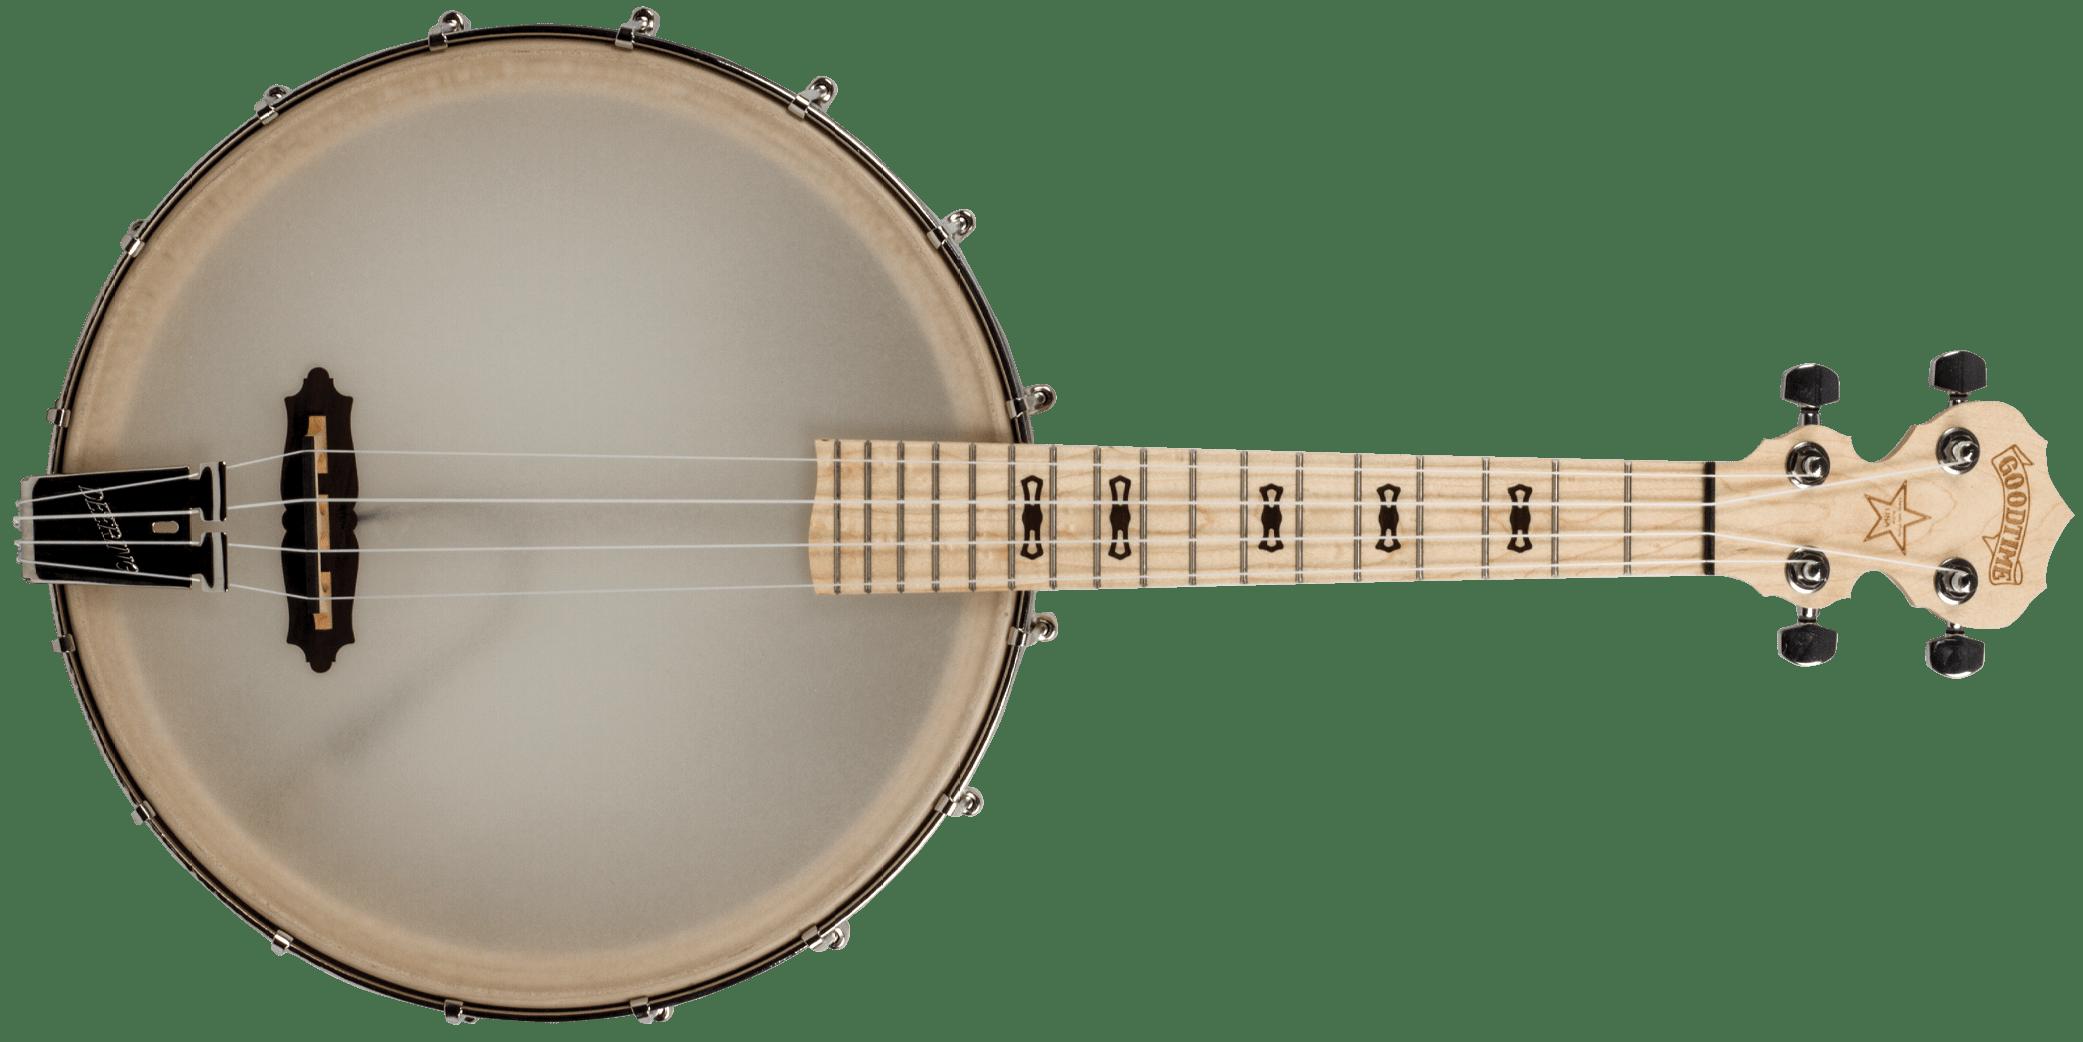 Banjo vs ukulele